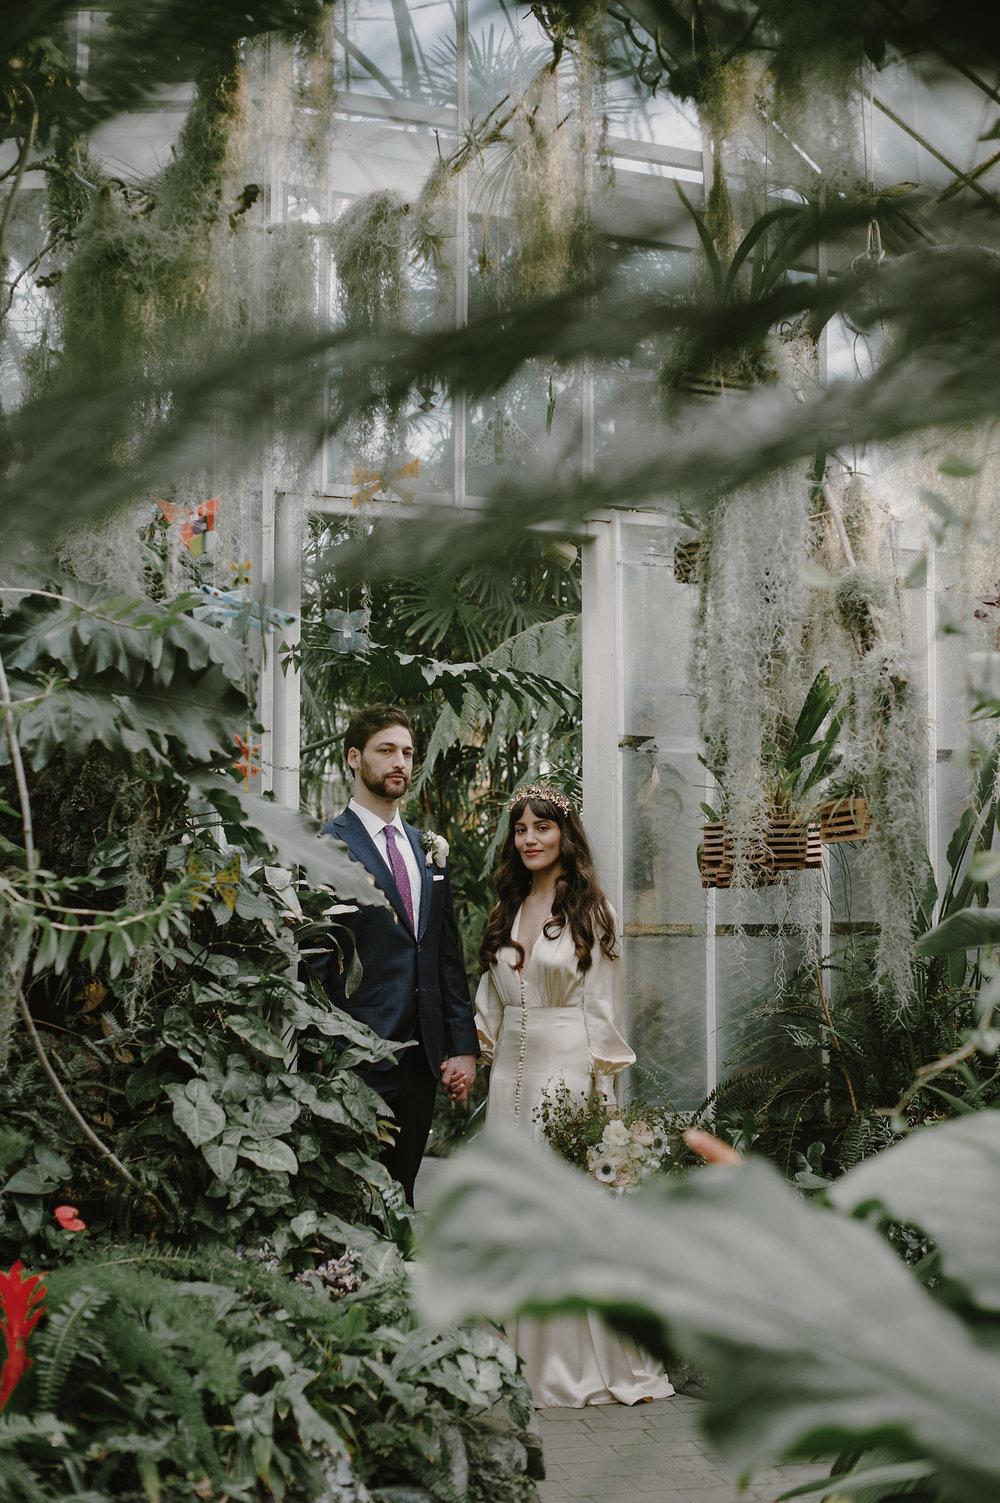 kristenmarieparker_tacoma_conservatory_warehouse_wedding061.JPG